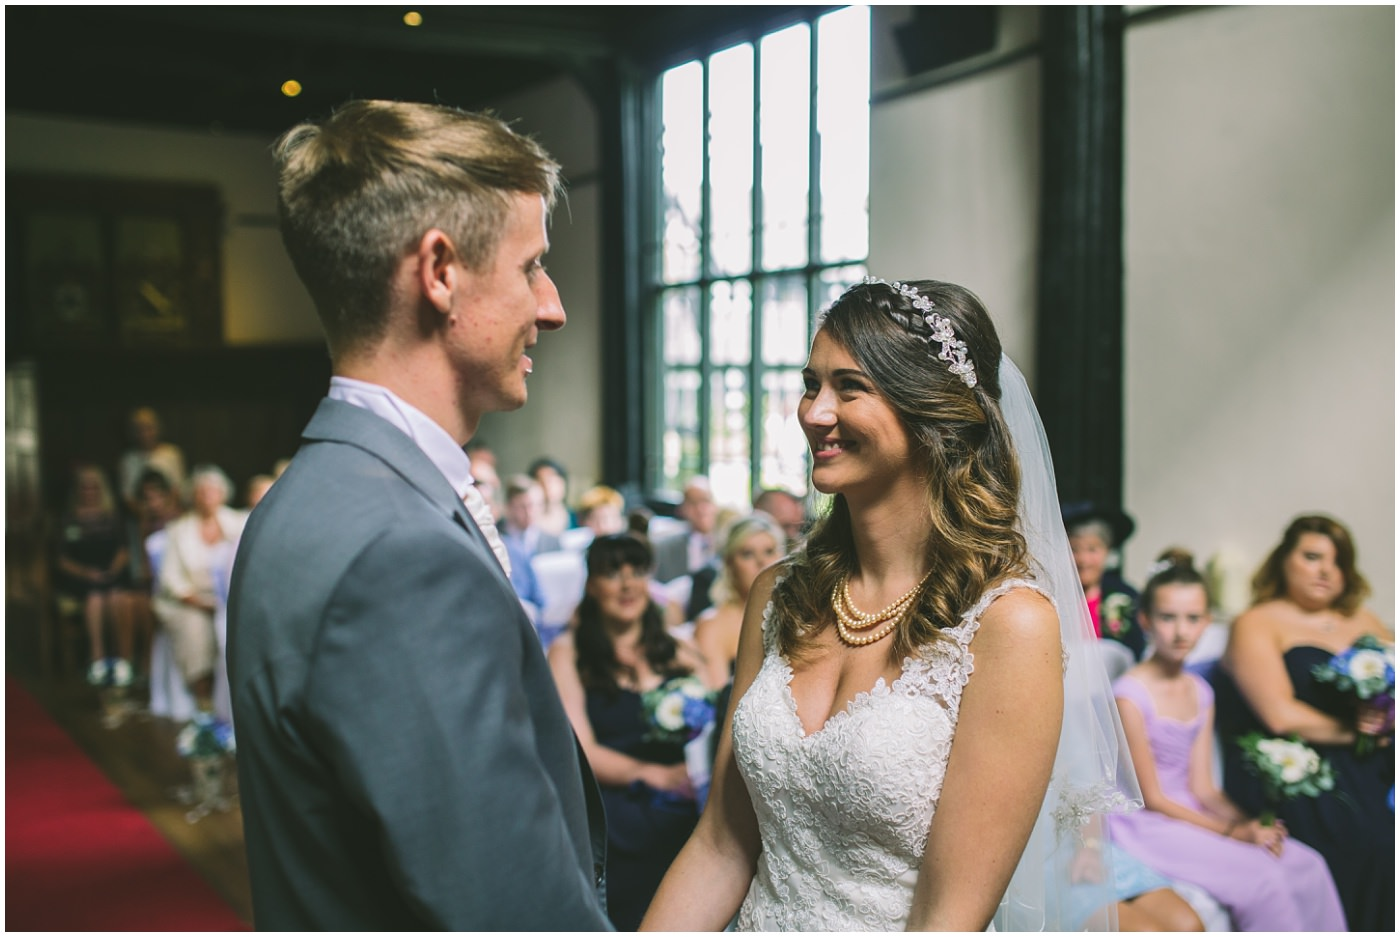 Samlesbury Hall wedding ceremony